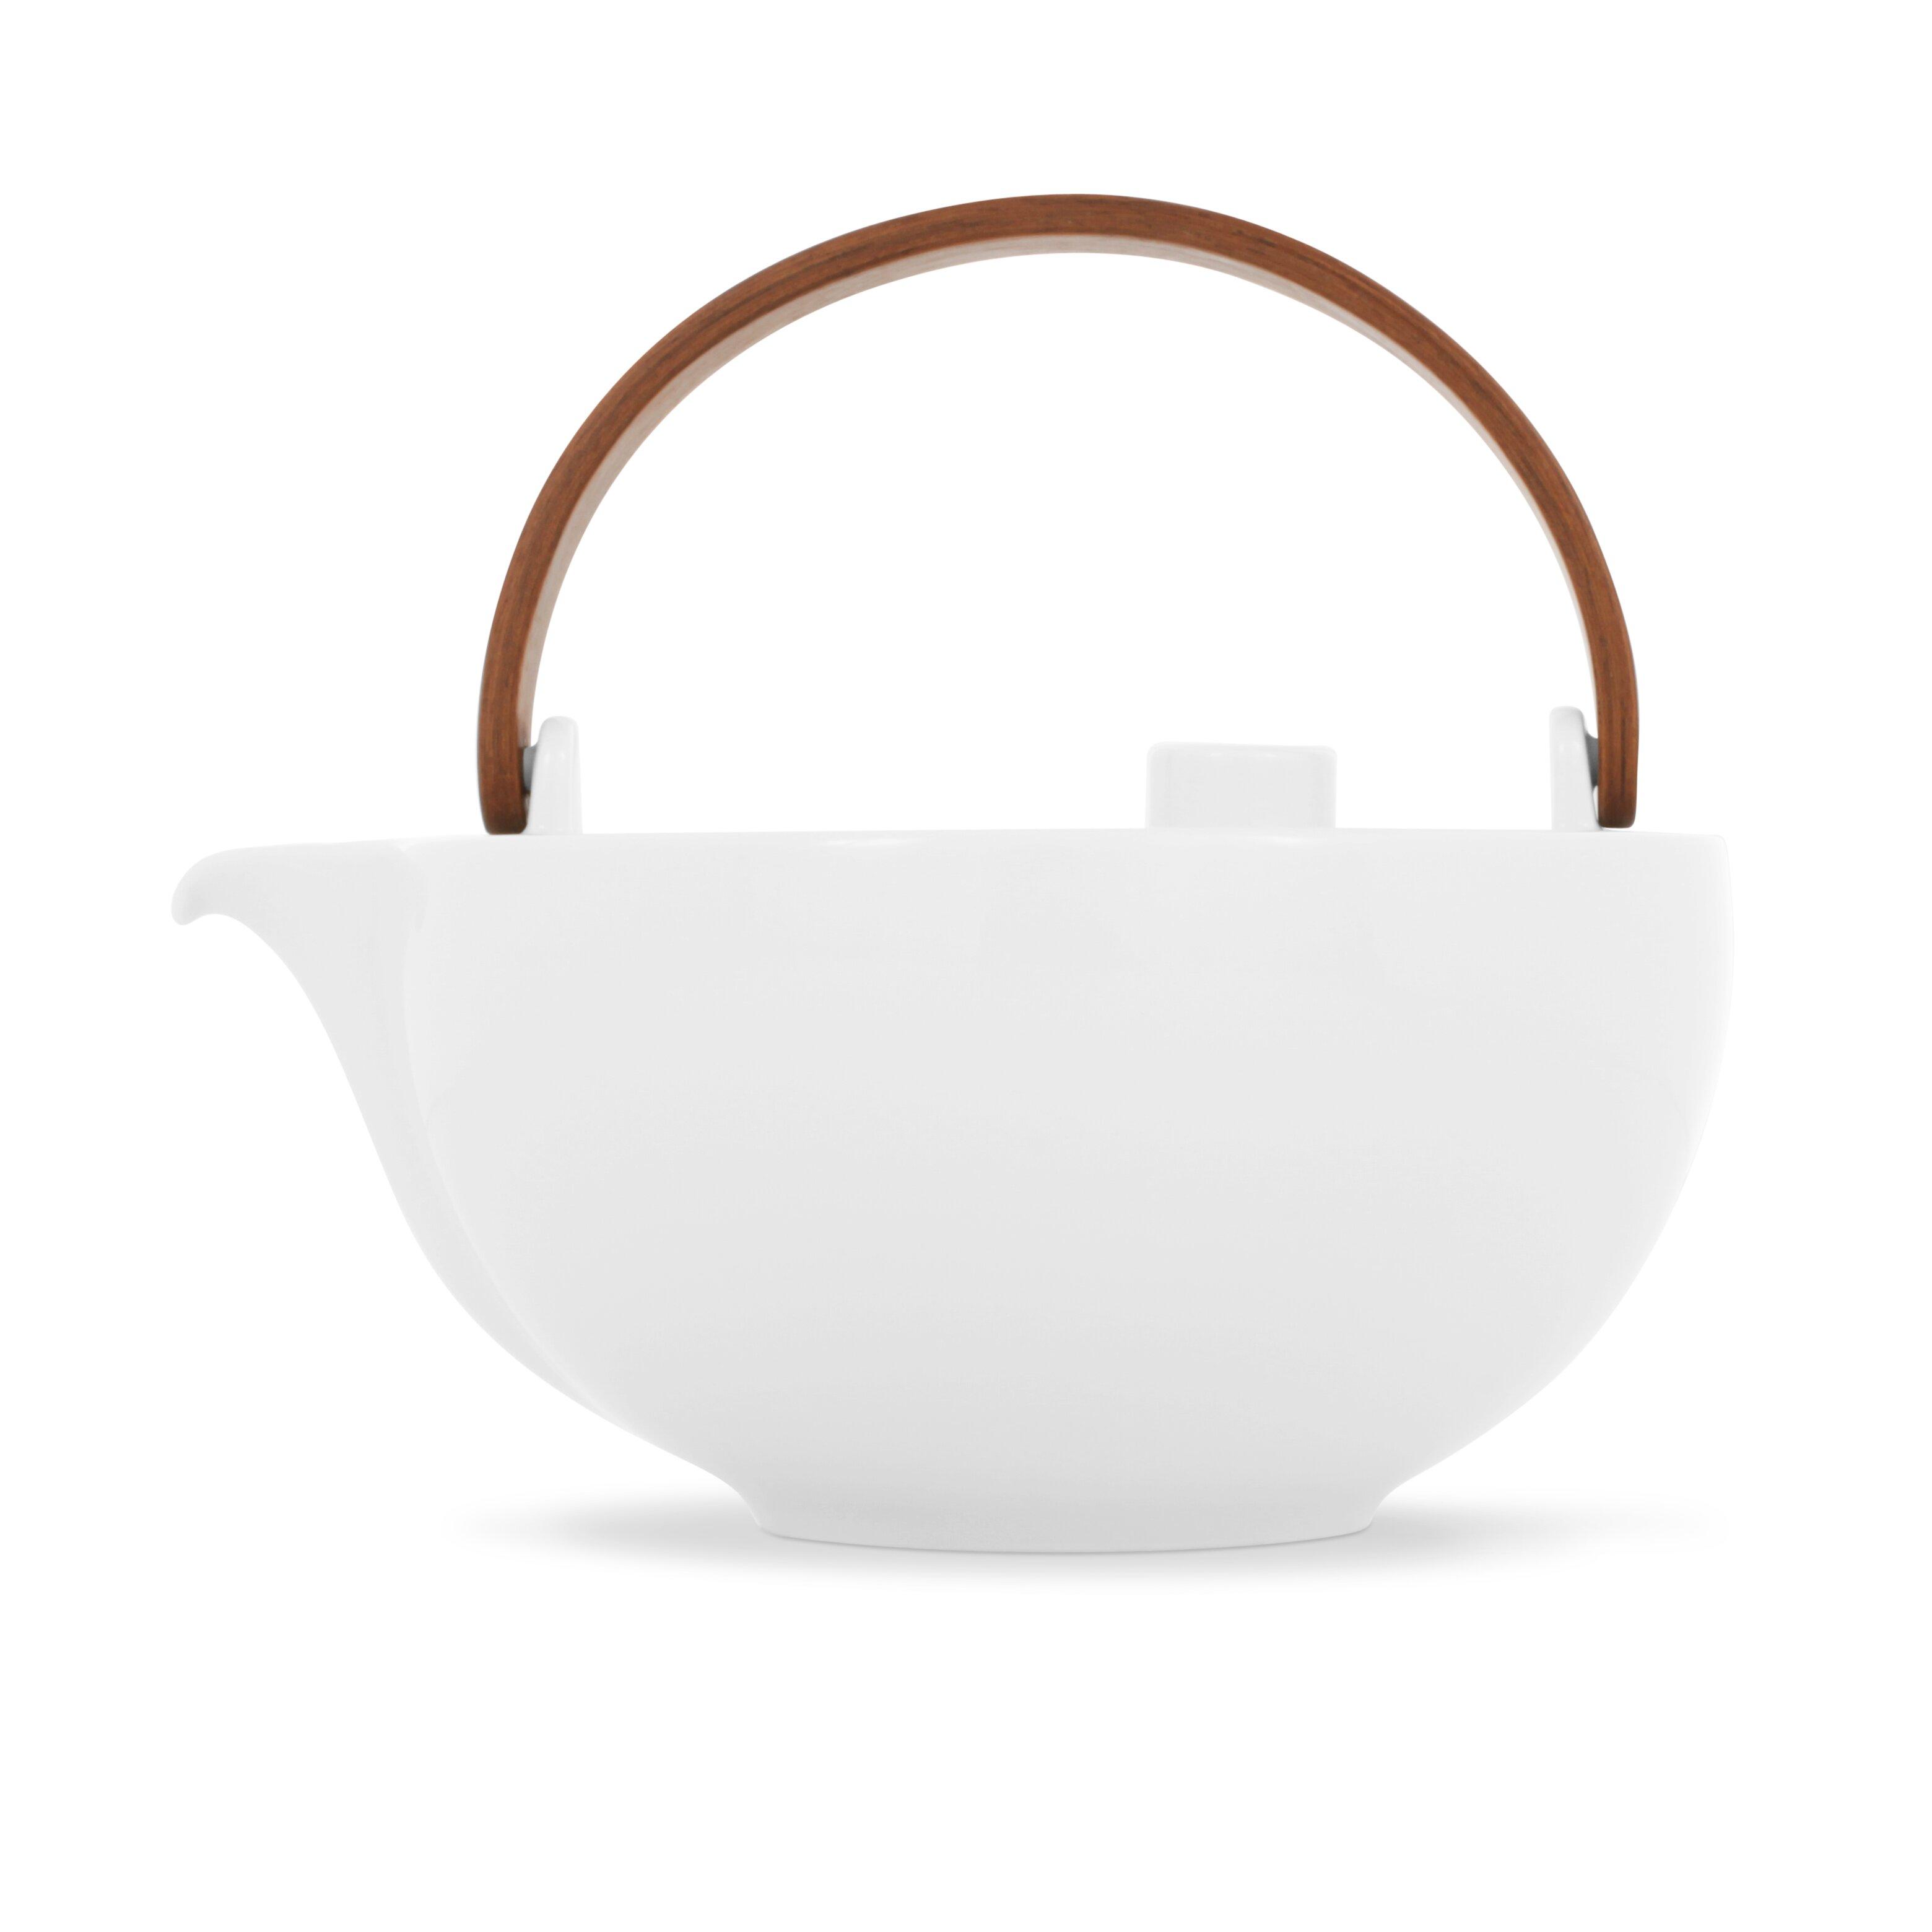 Friesland Chai Tea Pot With Wooden Handle & Reviews